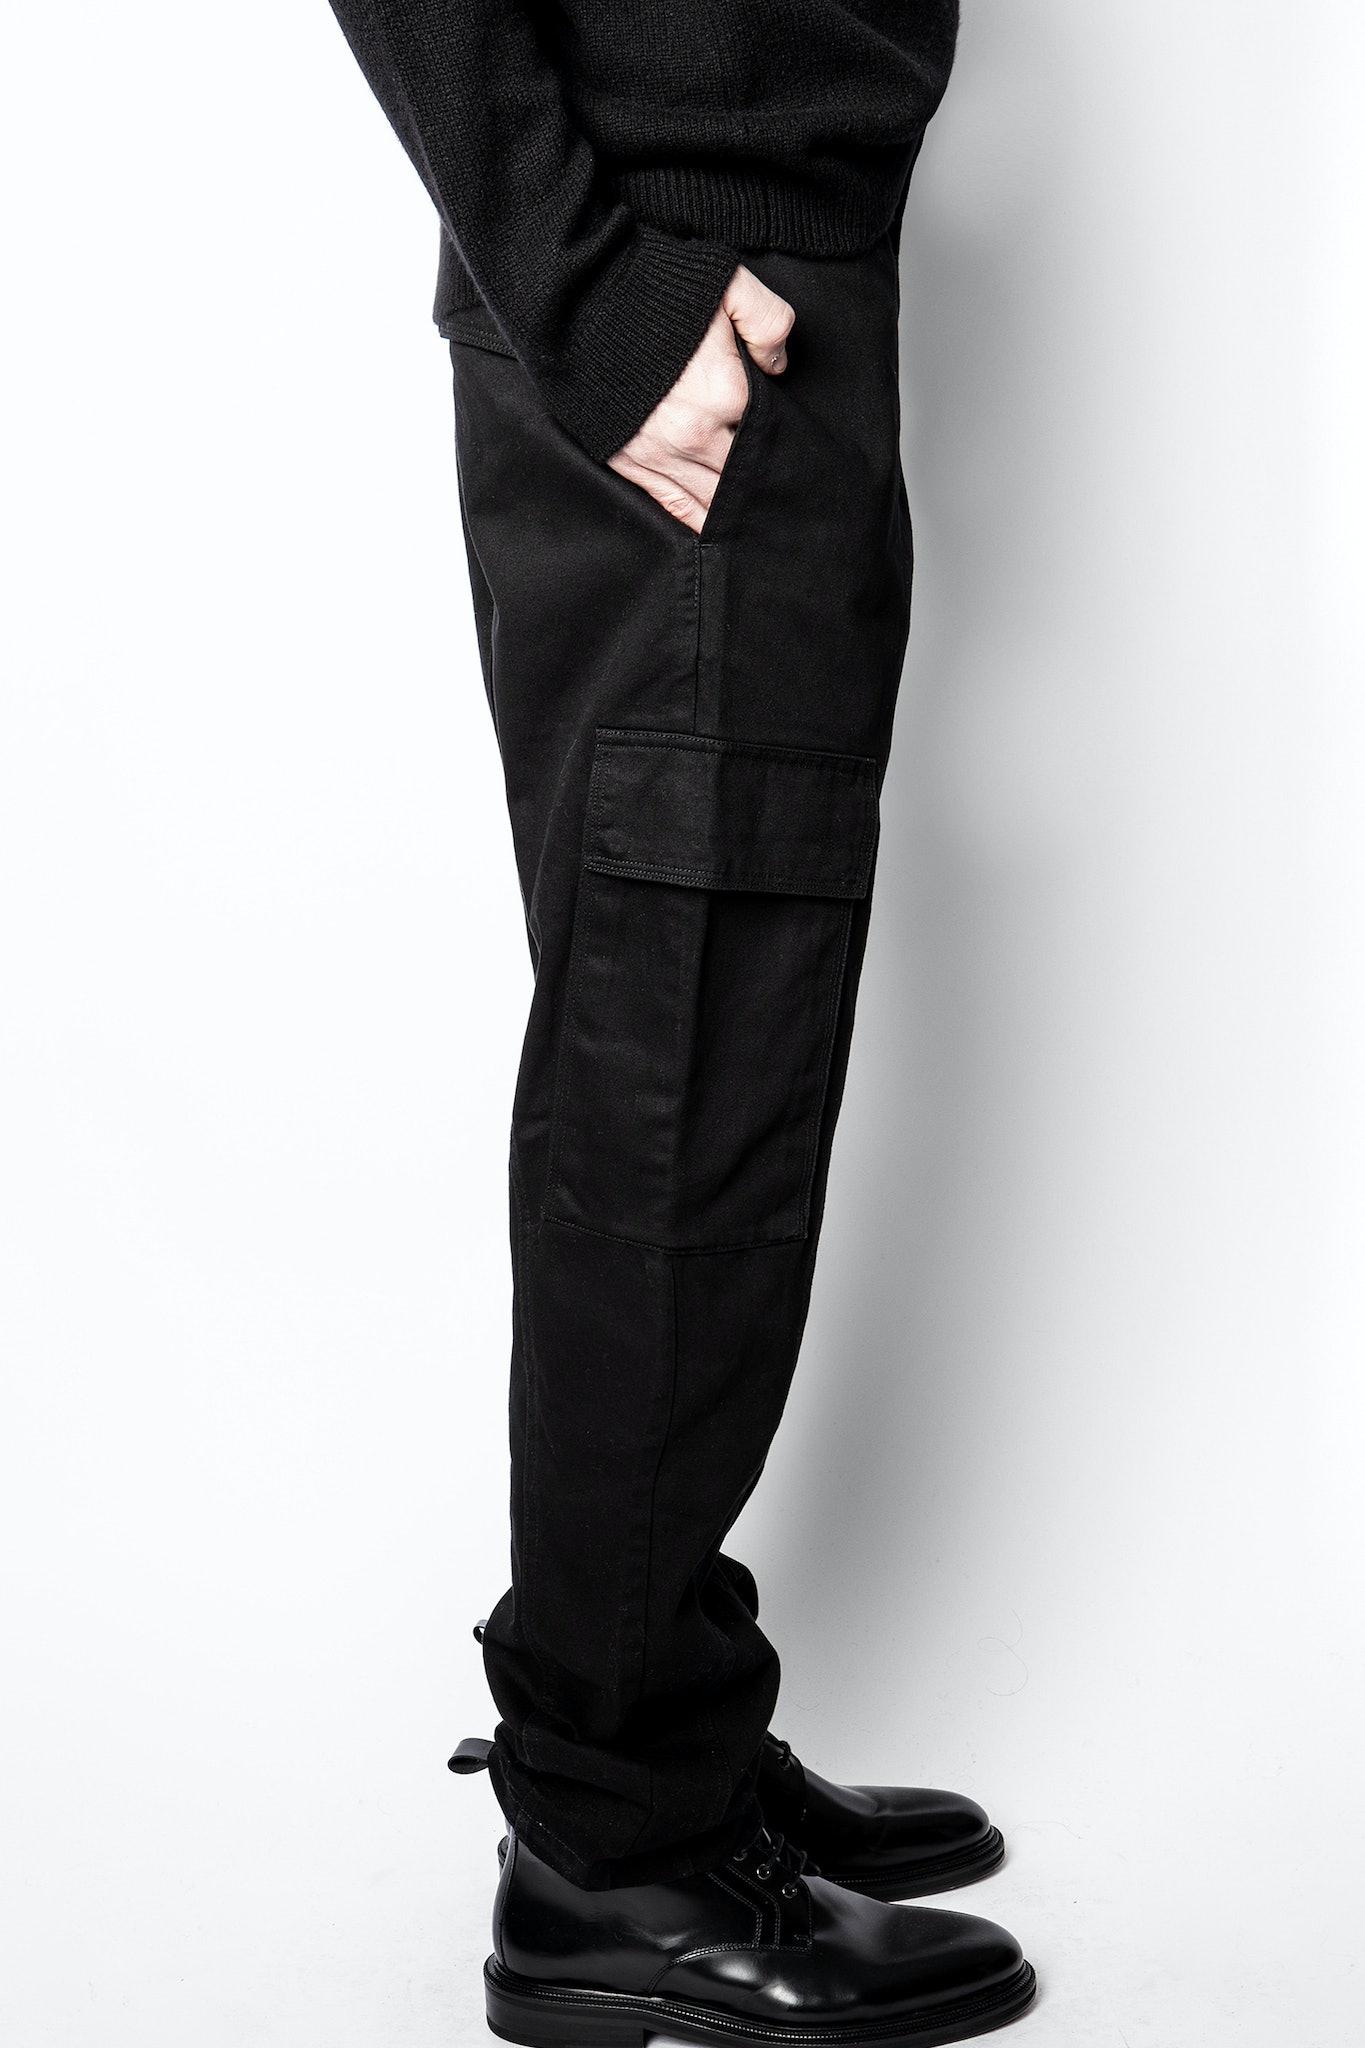 Pier Army Pants